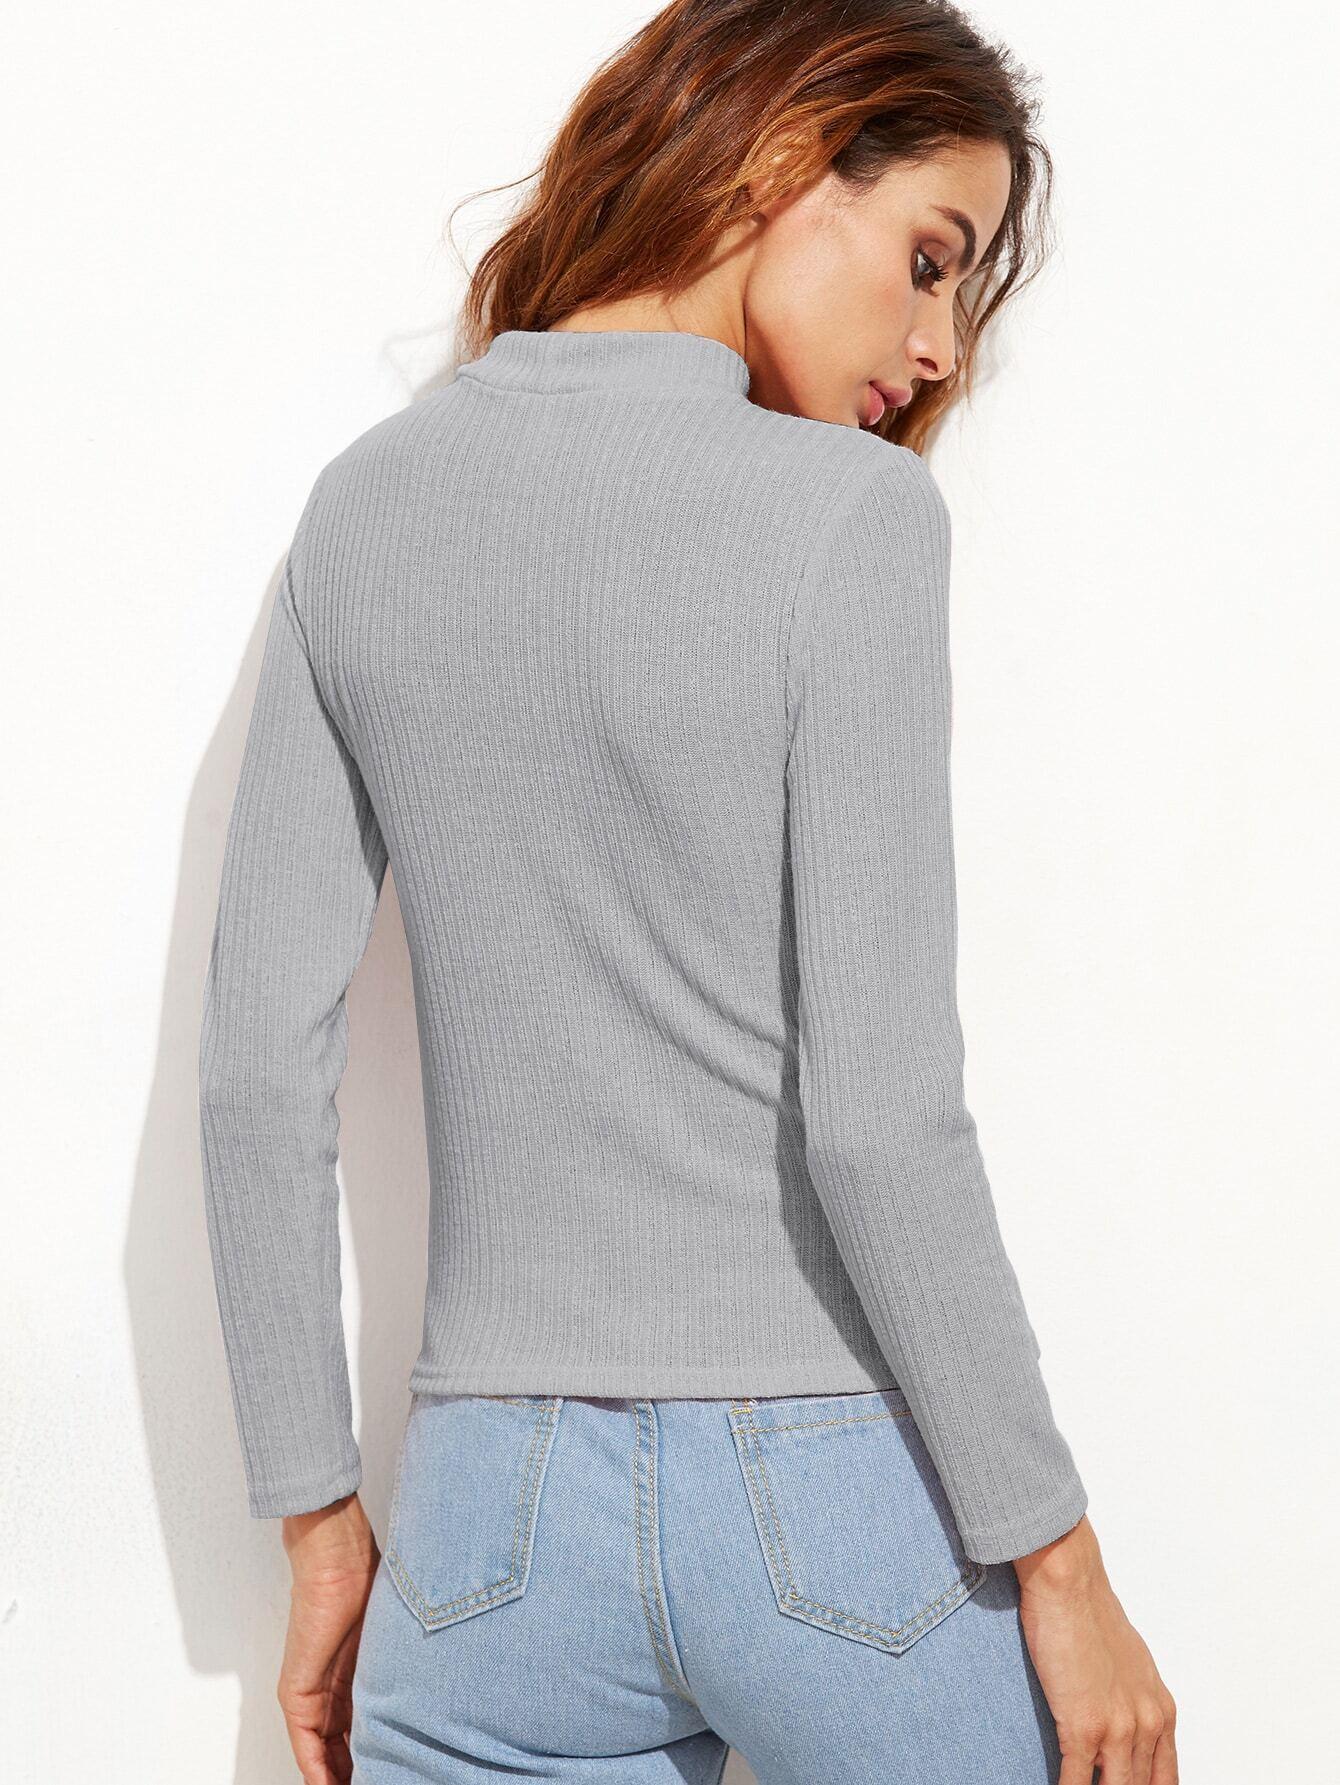 sweater161208104_2